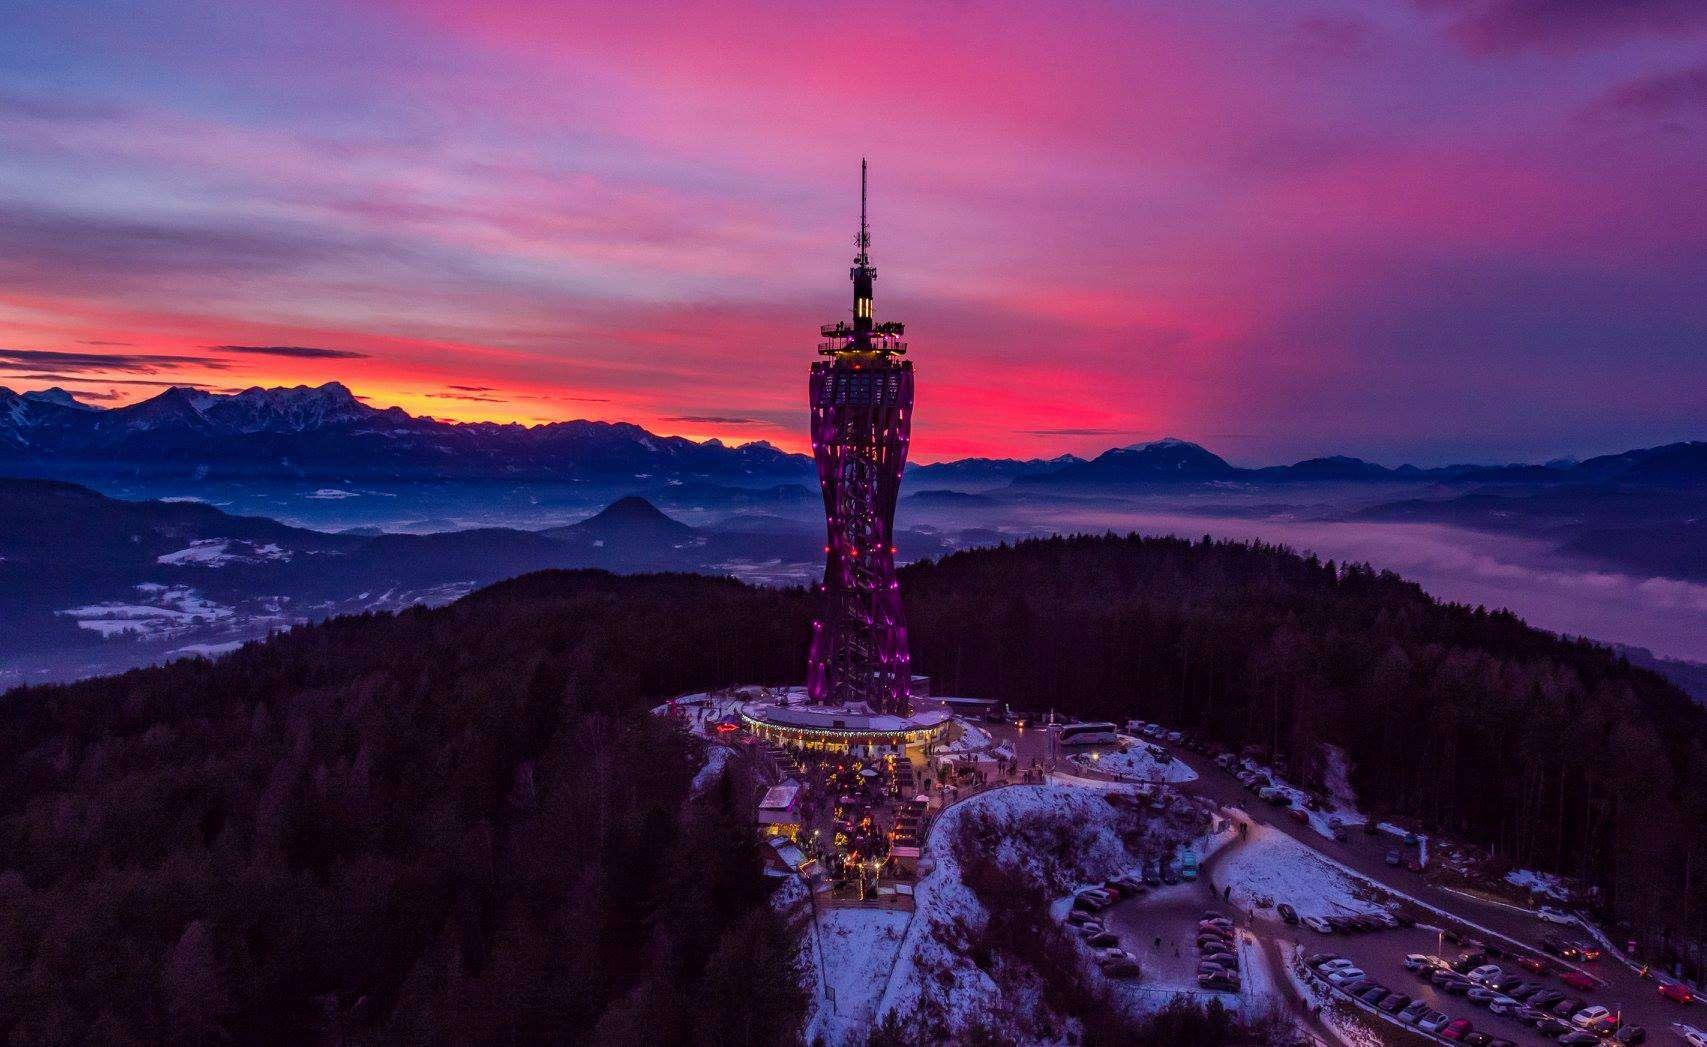 Adventmarkt am Pyramidenkogel bei Sonnenuntergang - Winter in Kärnten